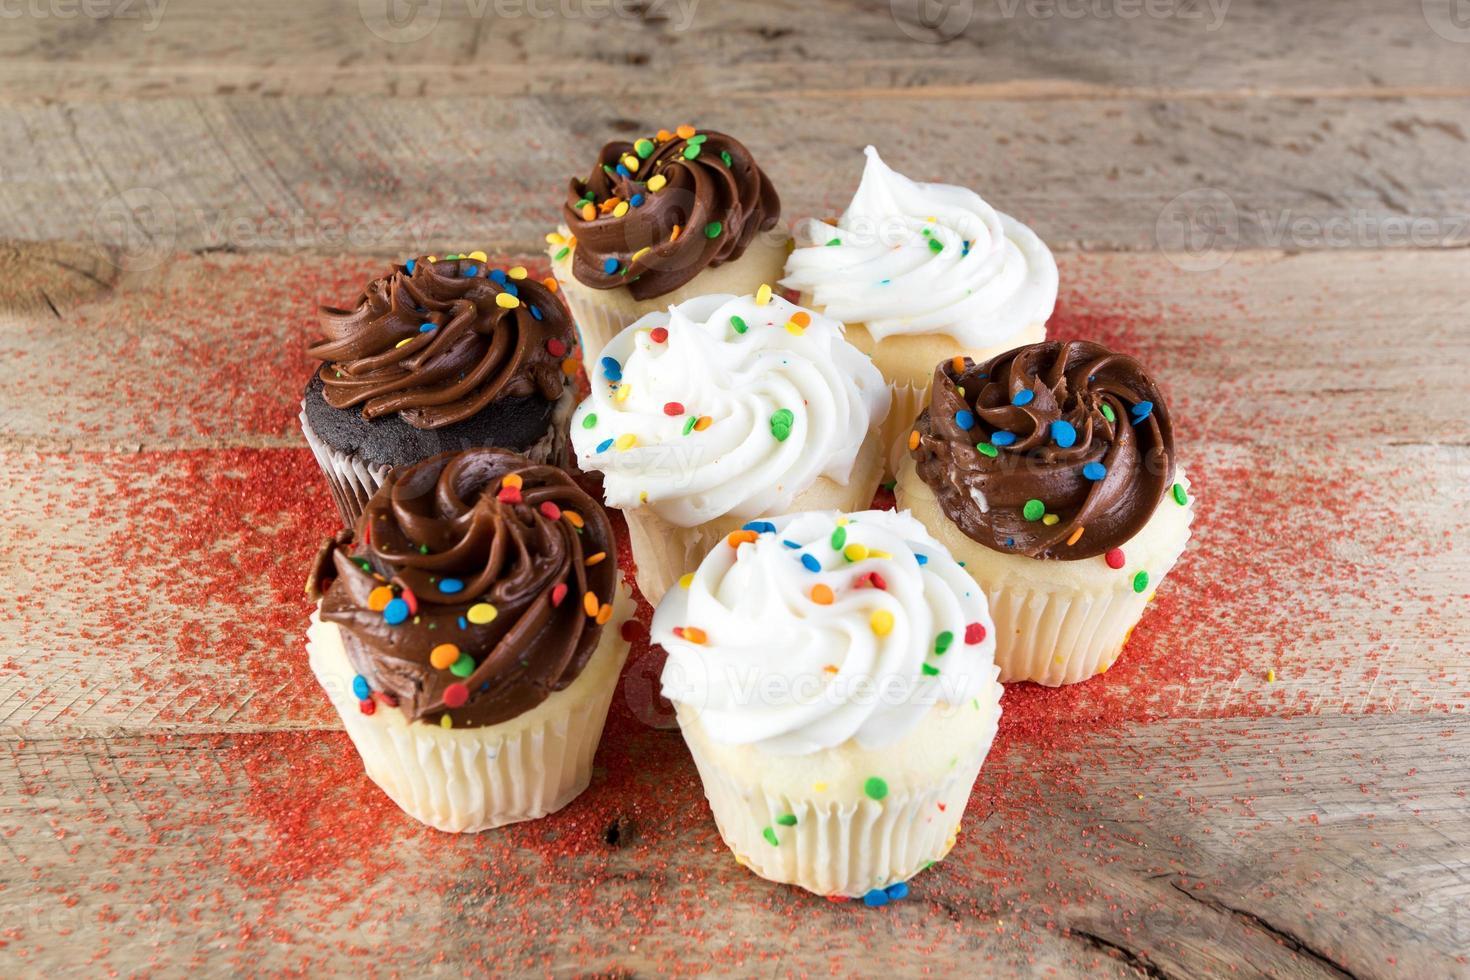 Homemade white and chocolate cupcakes. photo